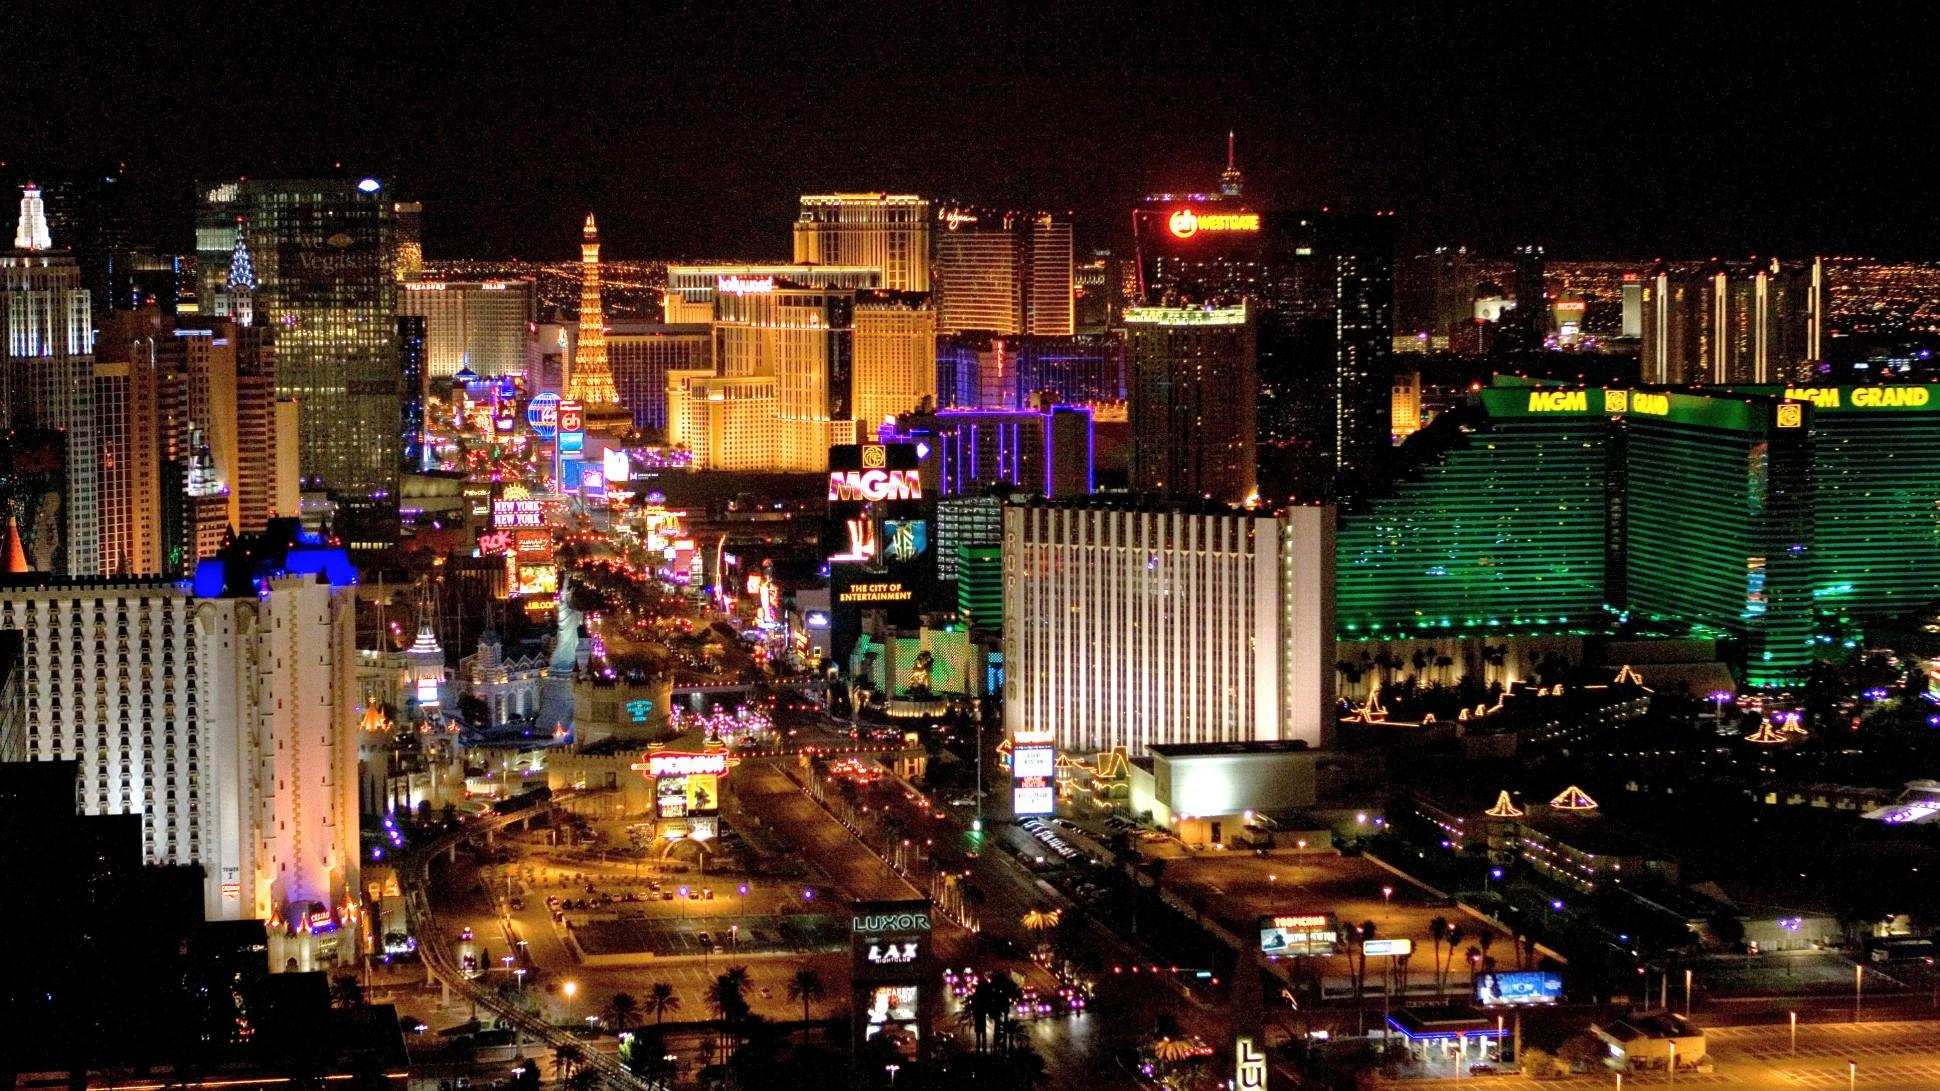 Las_Vegas_89-e1420837025720-1940x1091